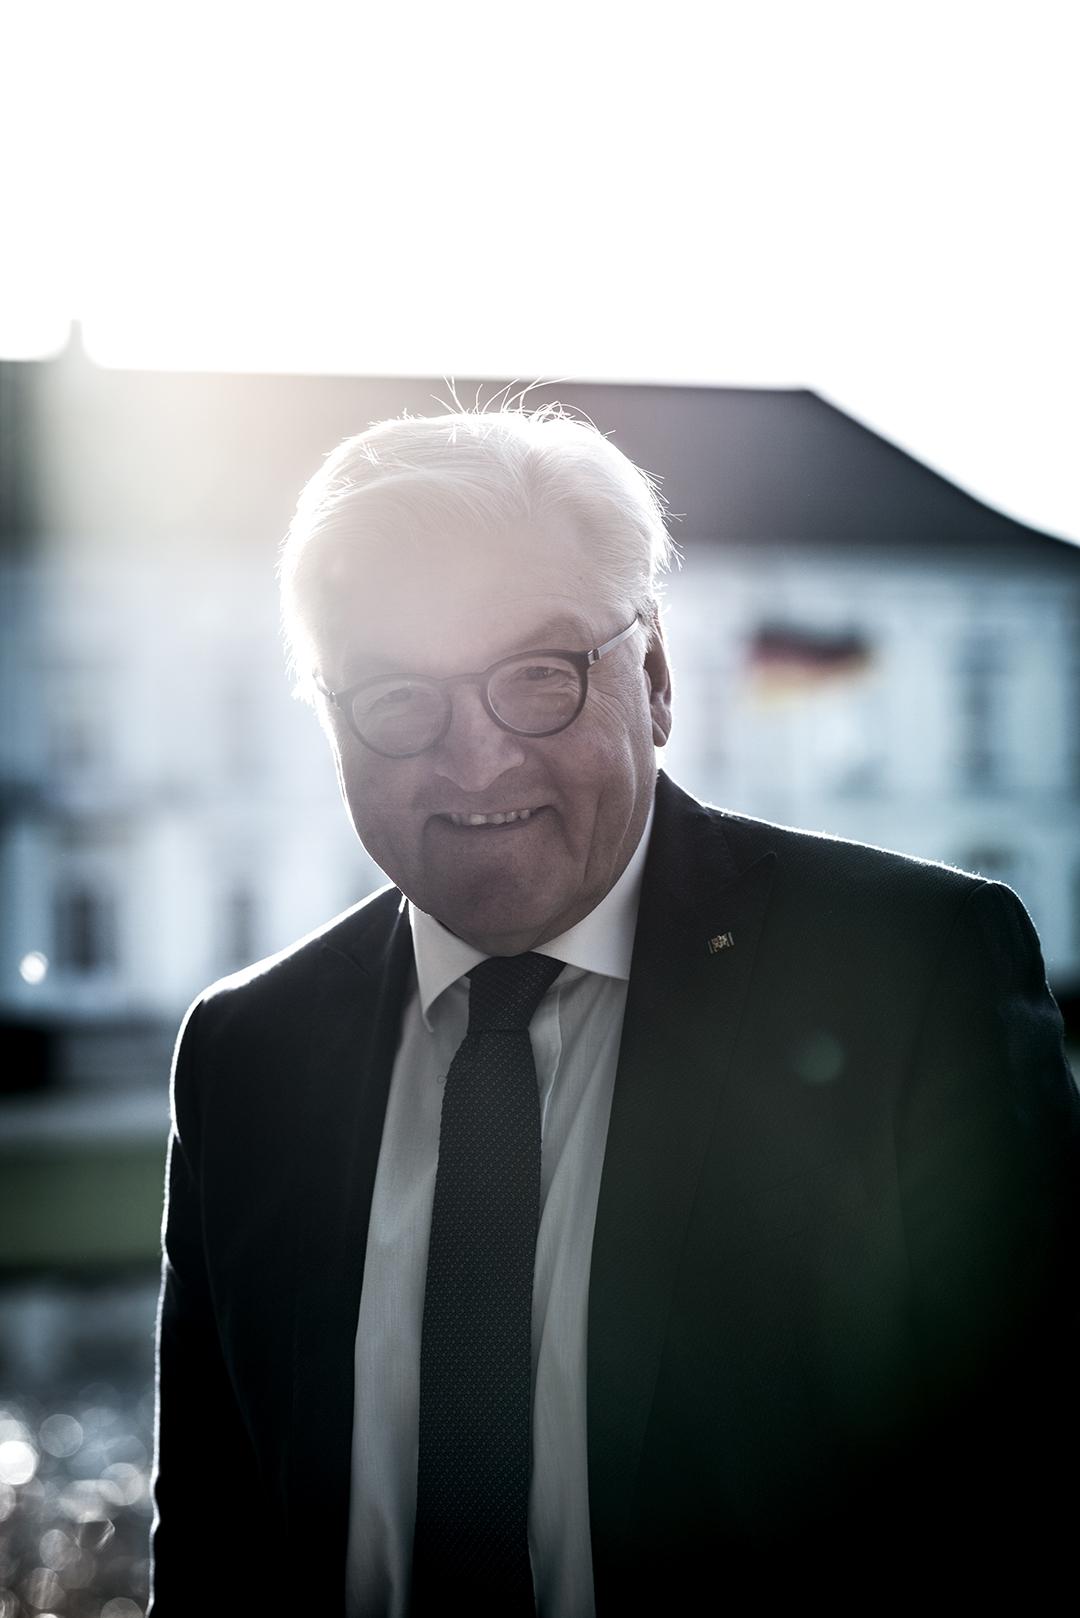 Frank-Walther Steinmeier